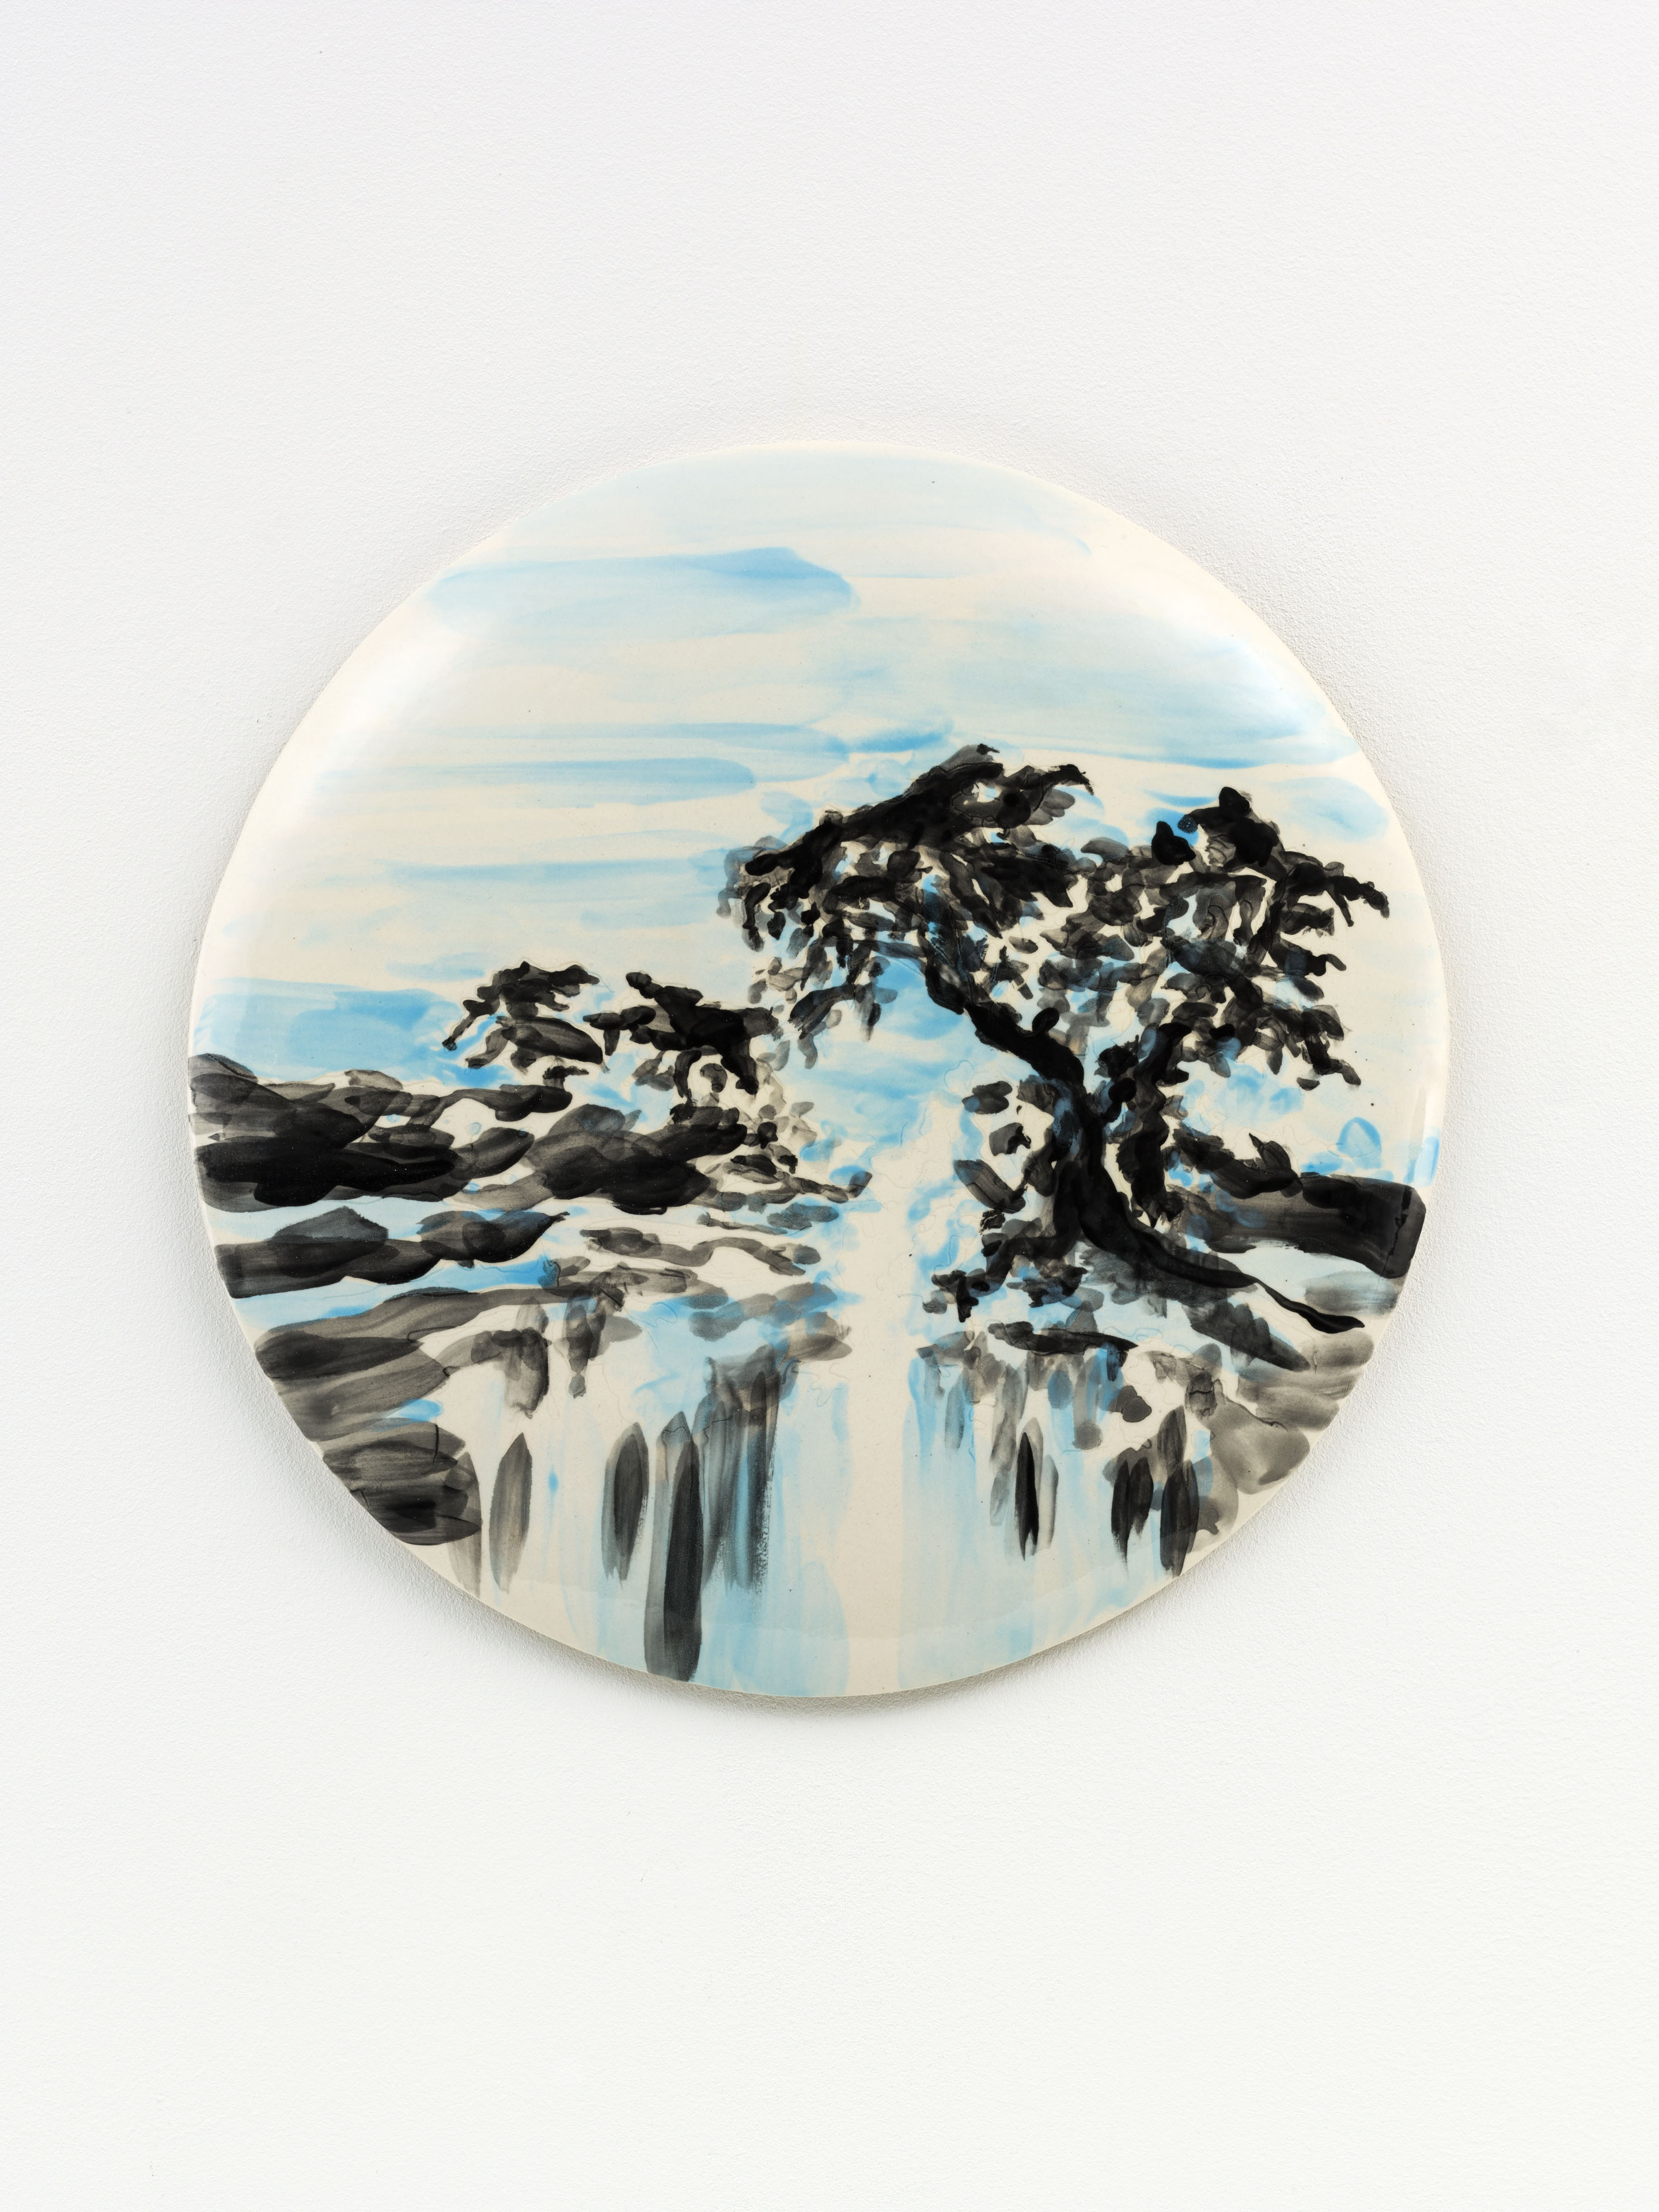 """O fim de Verao"", painted ceramic tile, 33 x 33 cm., NL 2015"